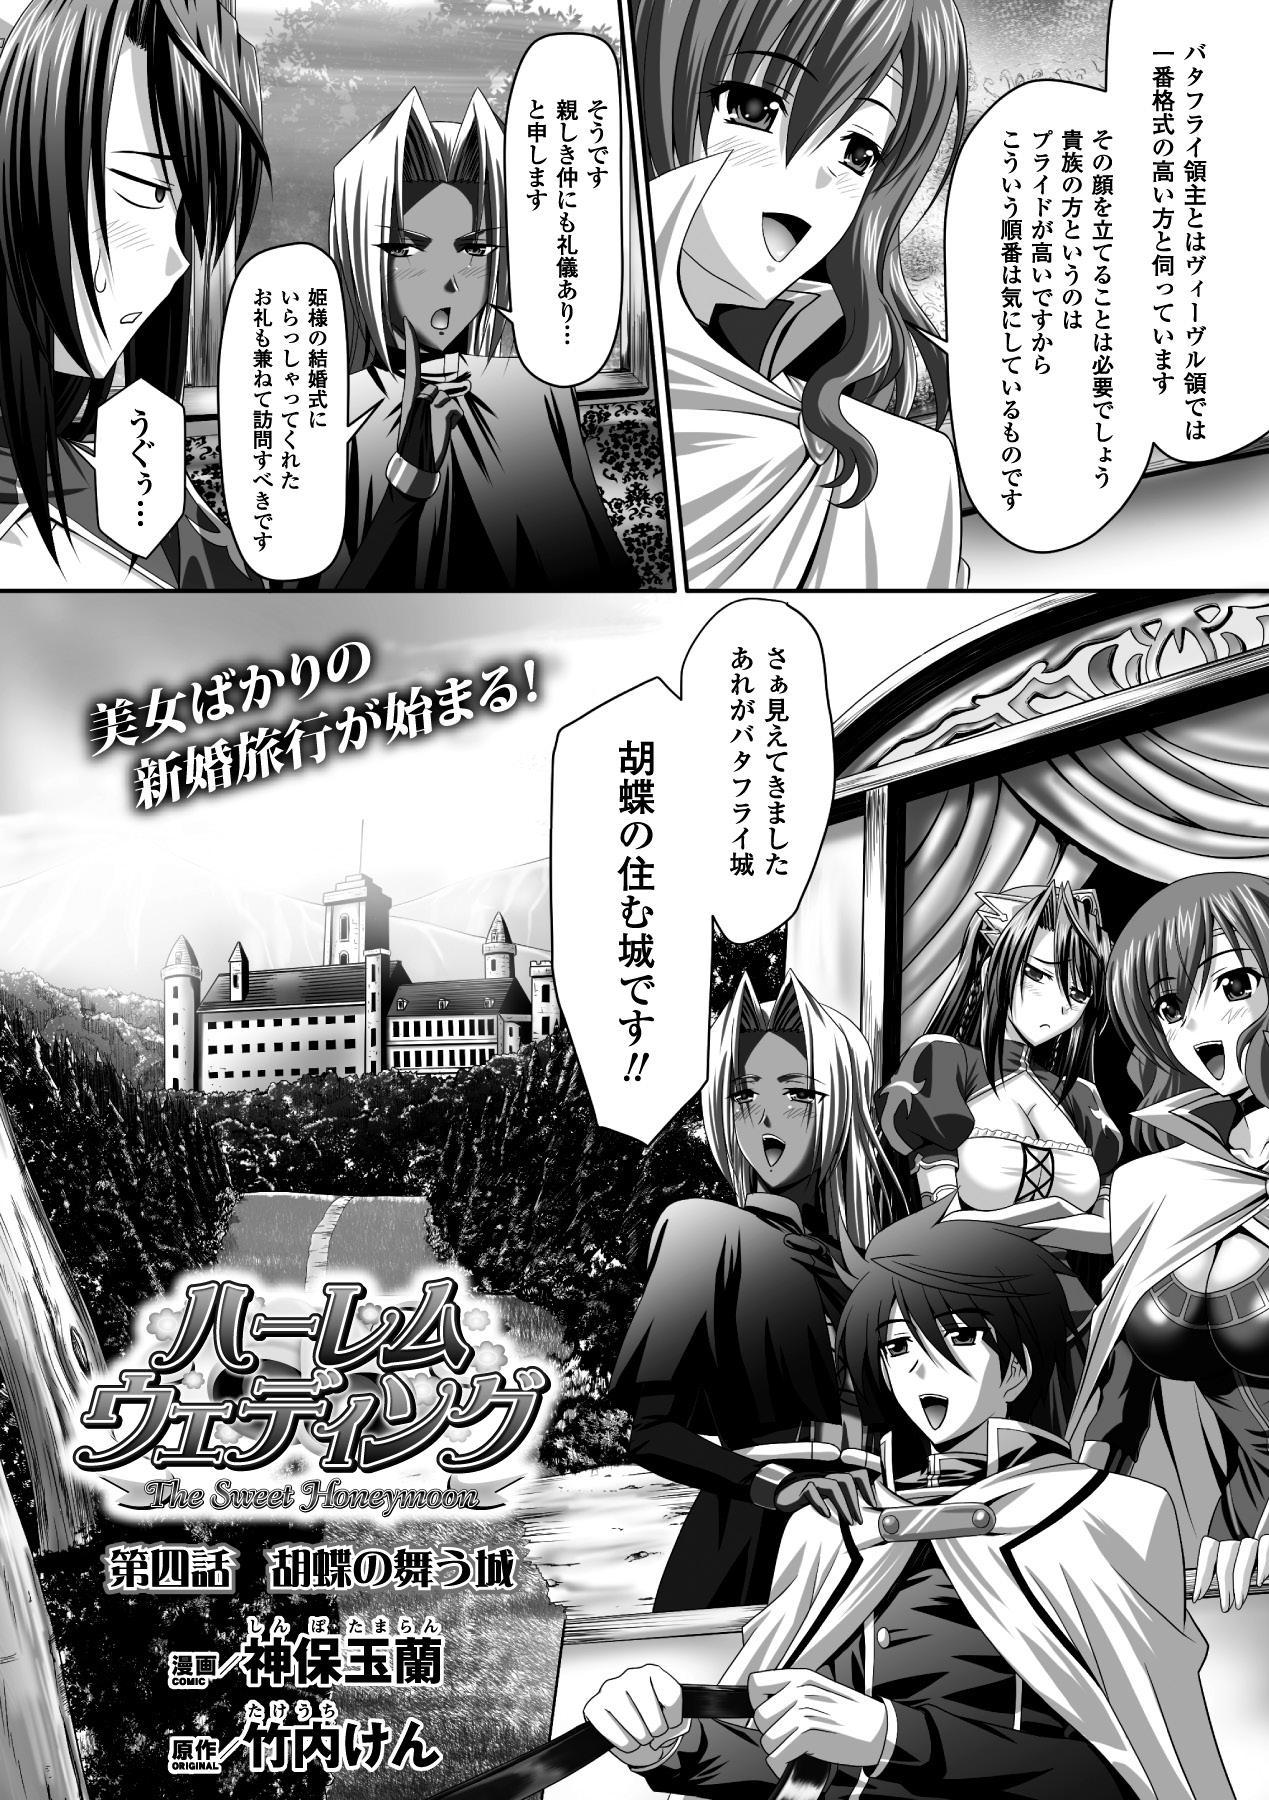 Megami Crisis 10 73